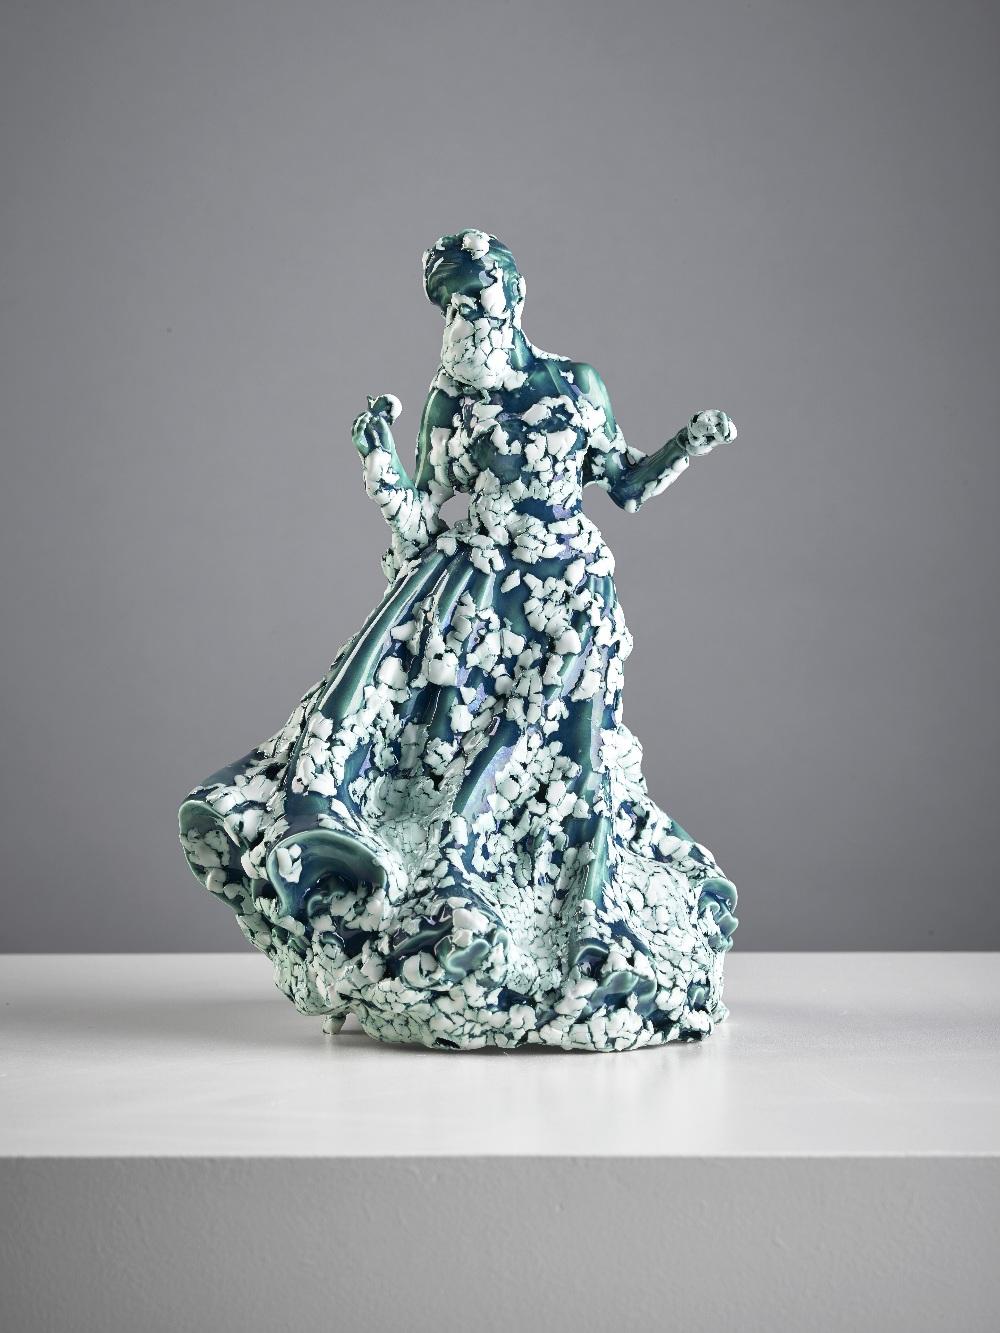 Lot 56 - JESSICA HARRISON (born 1982);Coalport Figurine - True Love - Limited Edition (2017), found